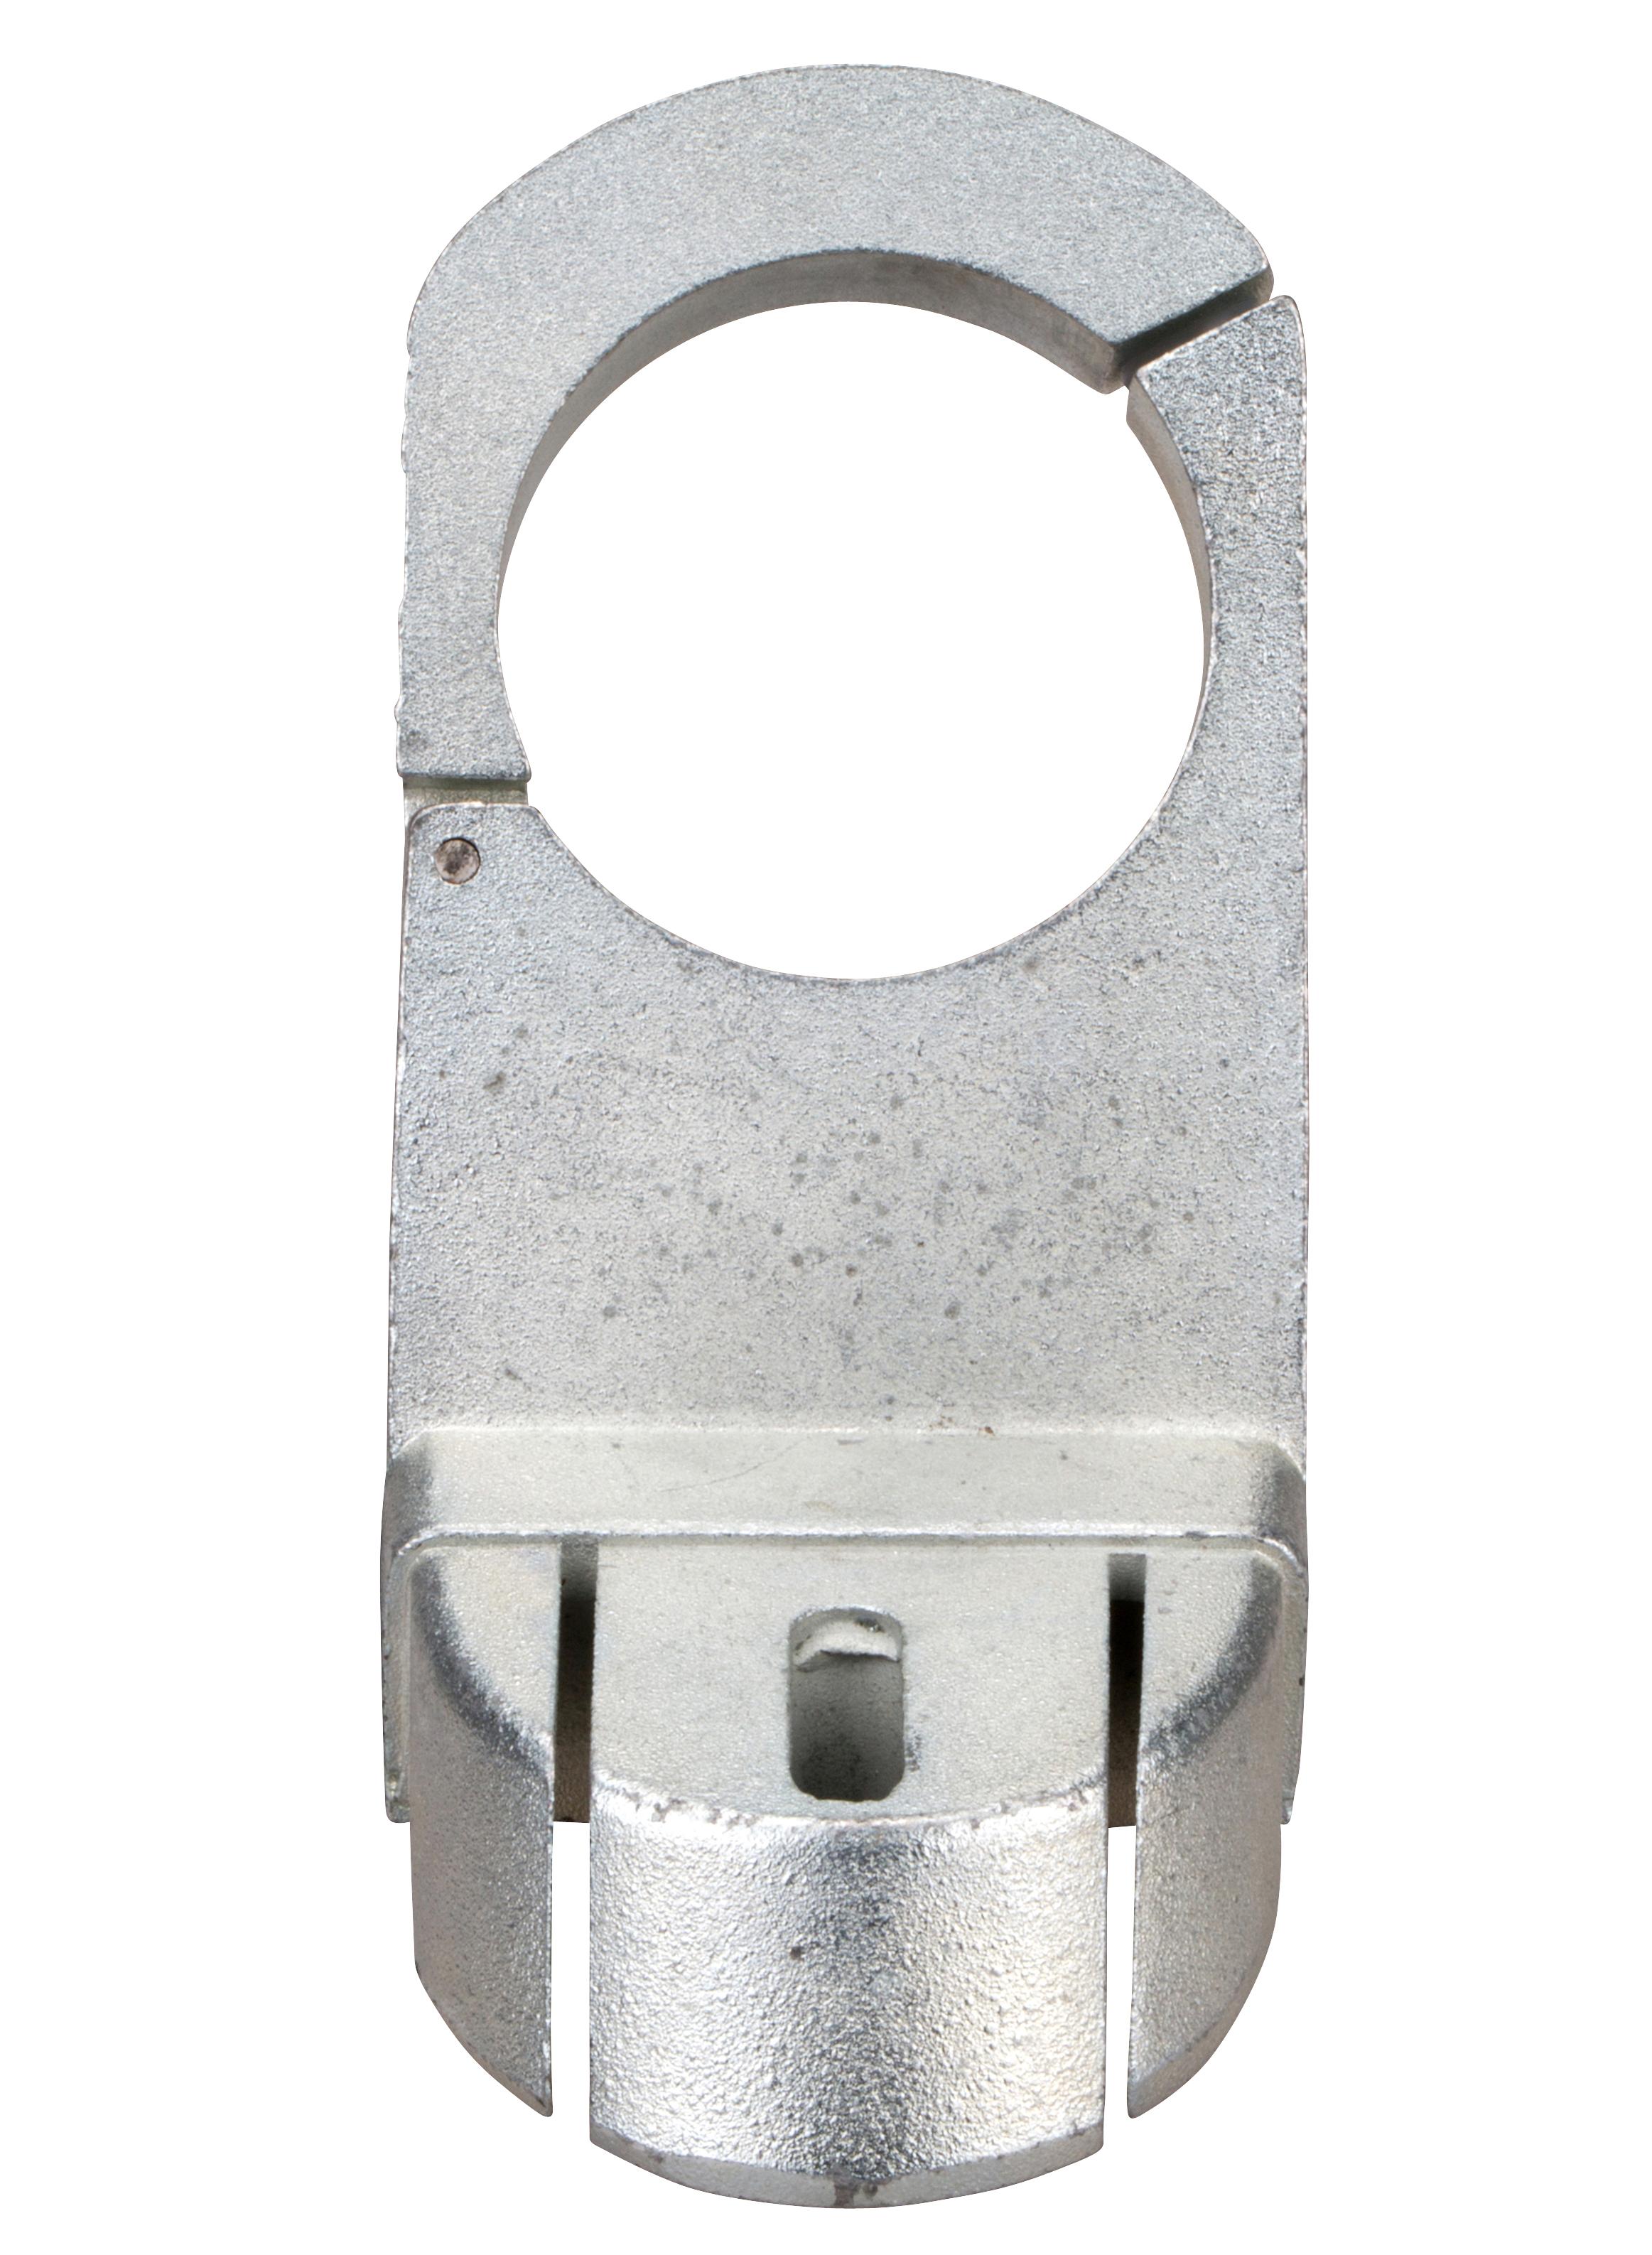 1 Stk SAT LNB Halter Aluminium, Ersatz für PVC Halter HSATZLH1A-